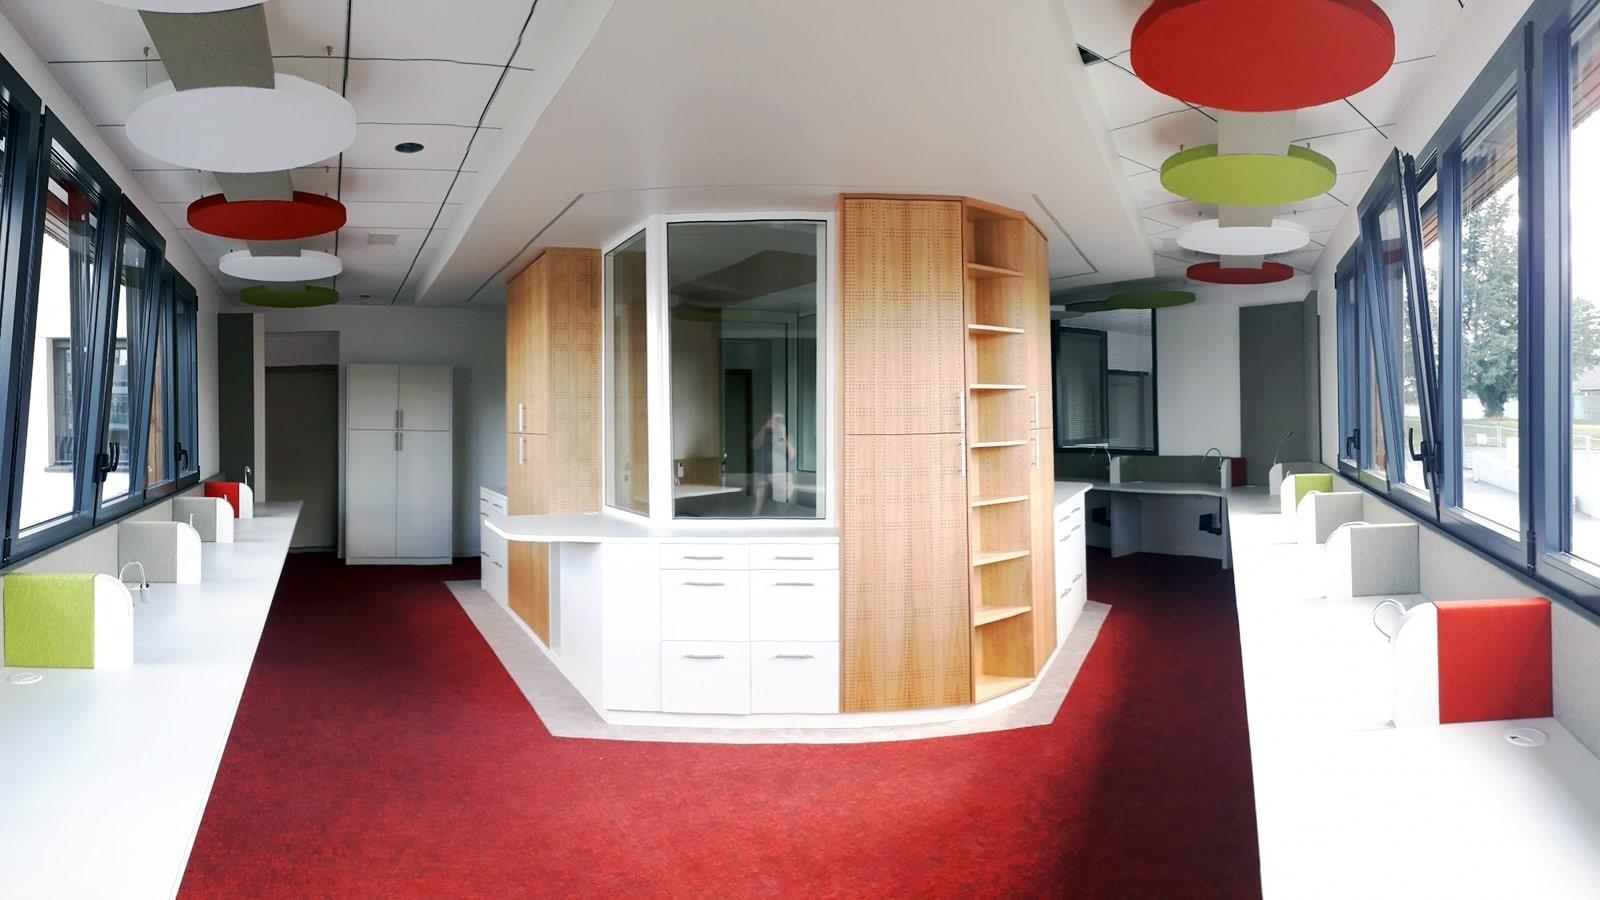 Bureaux Had Cholet Efi Design (3)